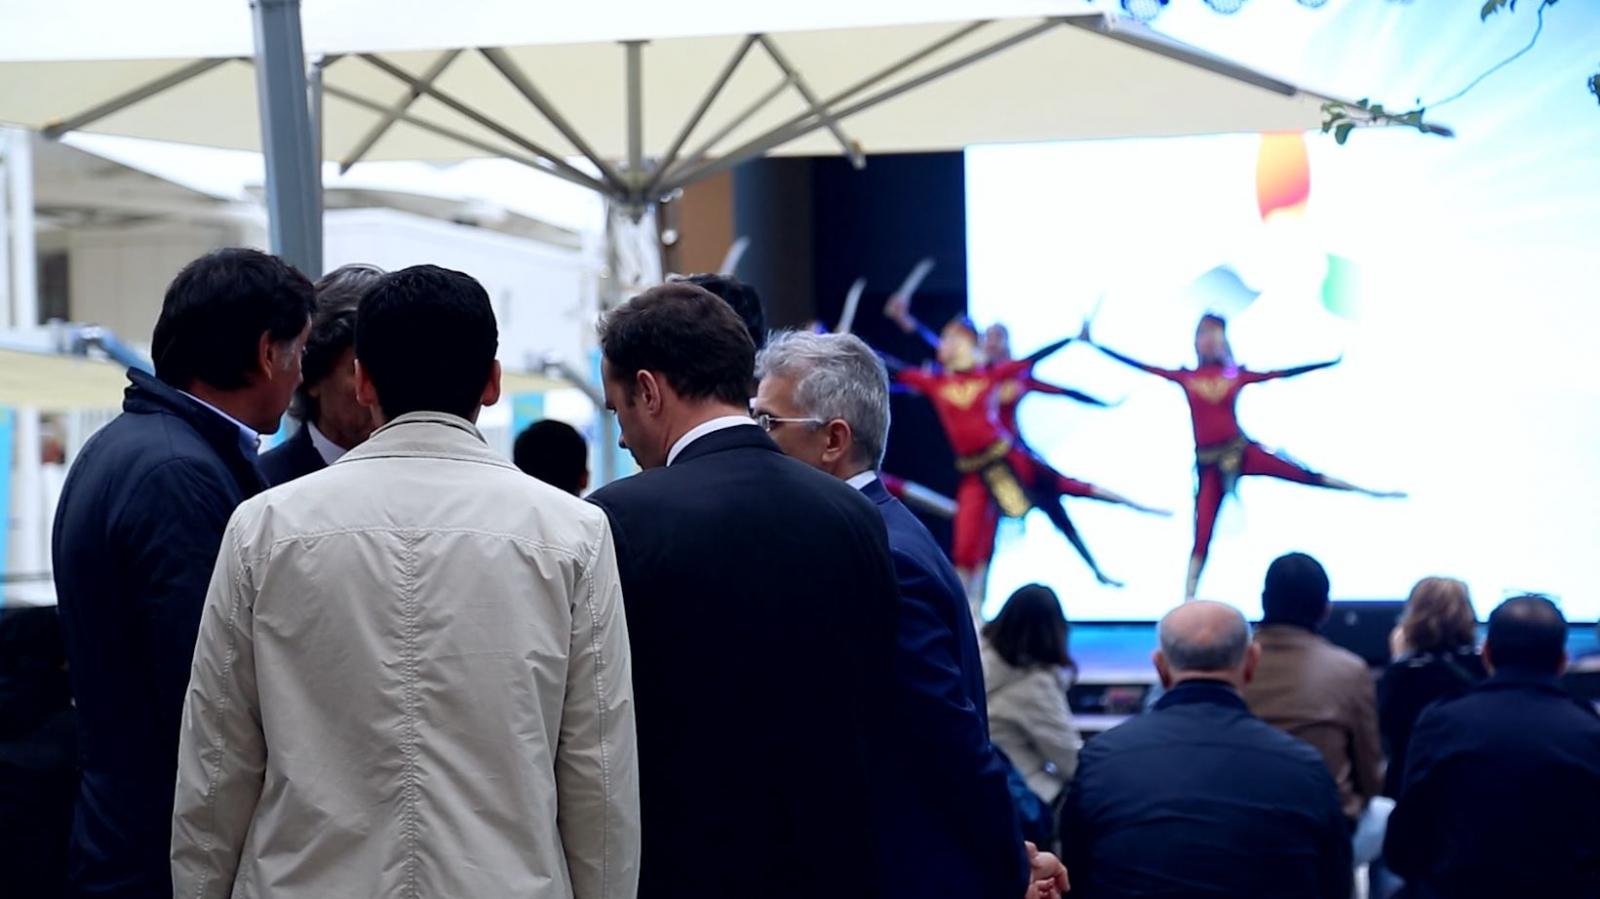 Expo Milano 2015: Business